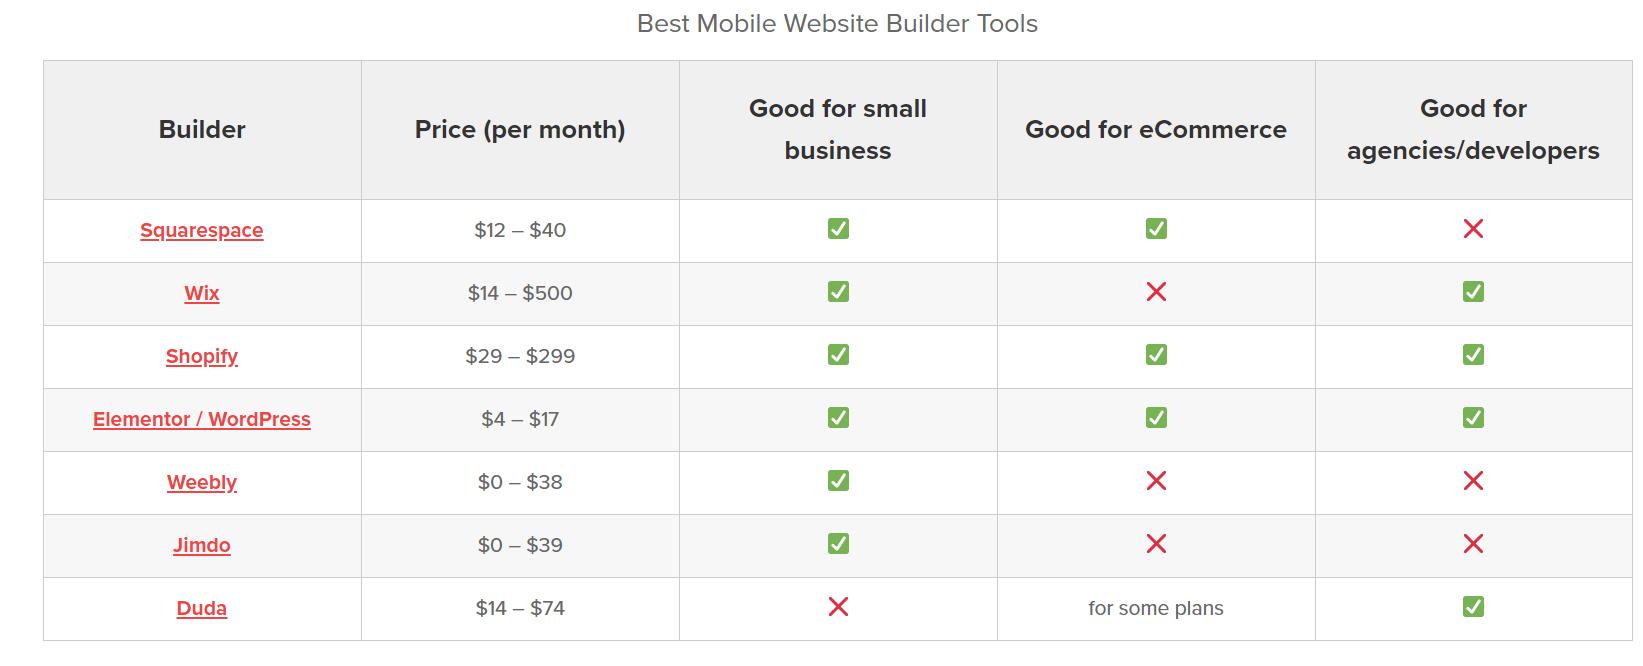 mobile website builder tools